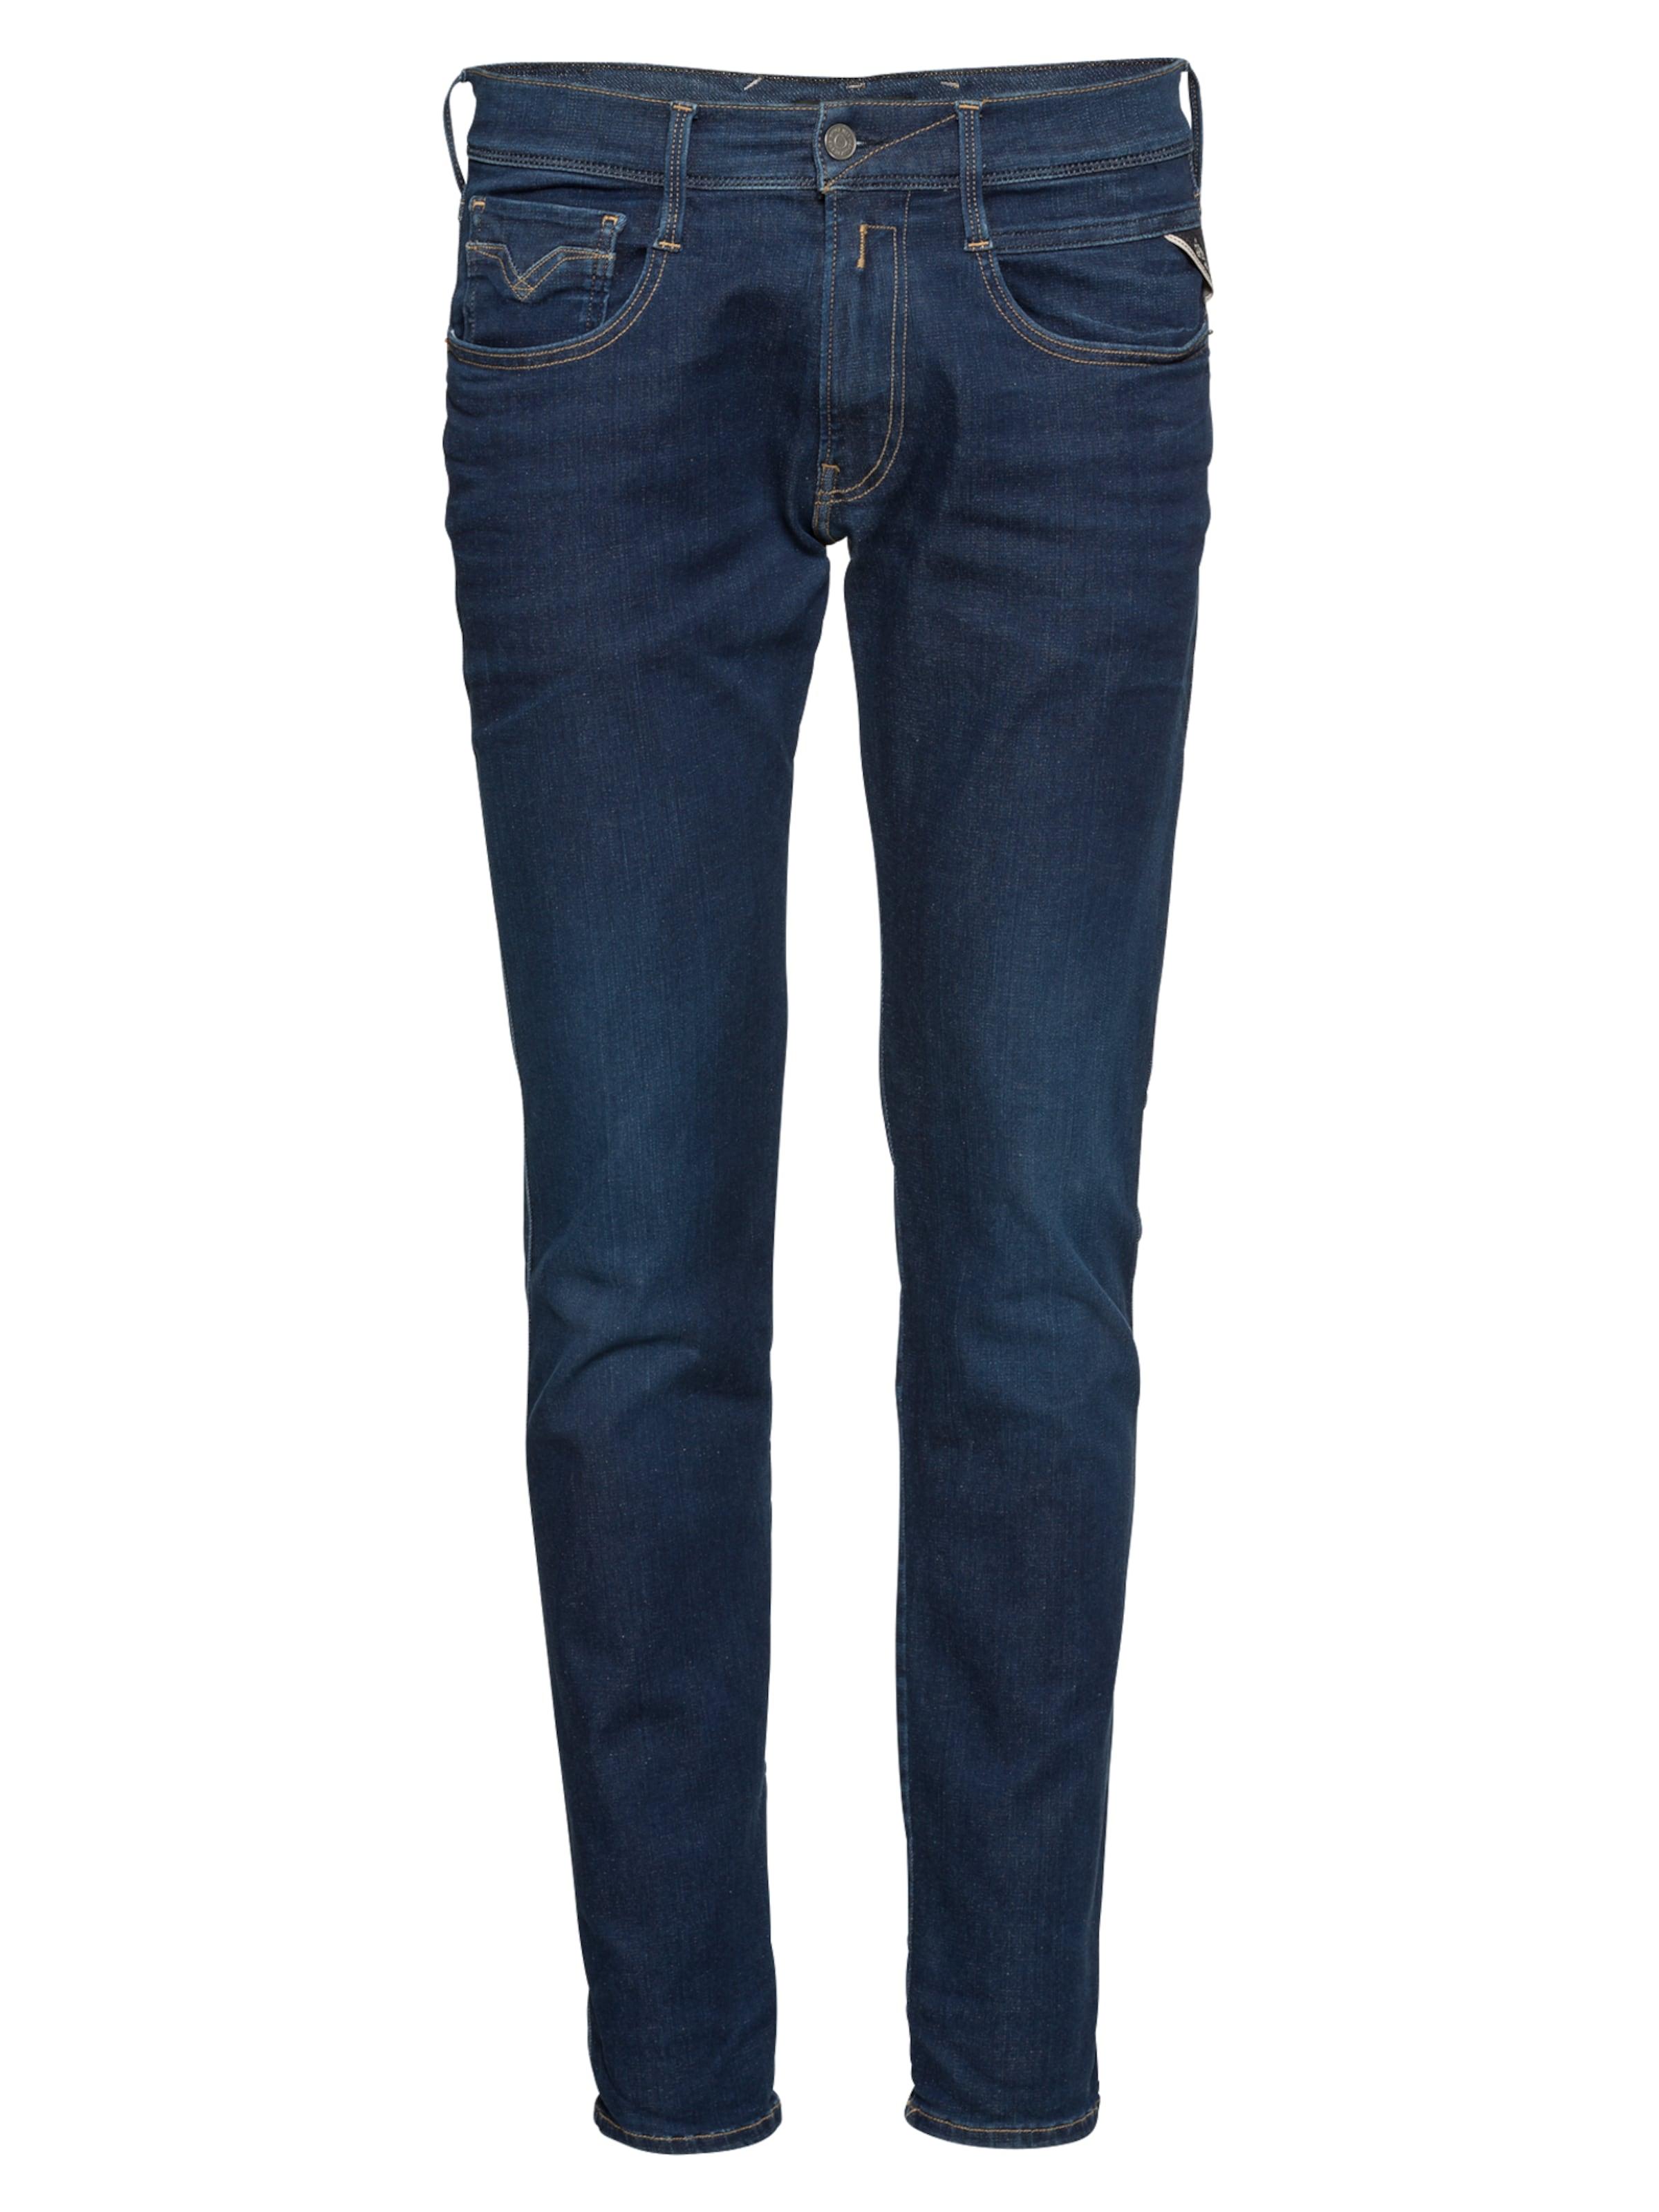 'anbass' In Replay Denim Jeans Blue kwTPiOXuZ